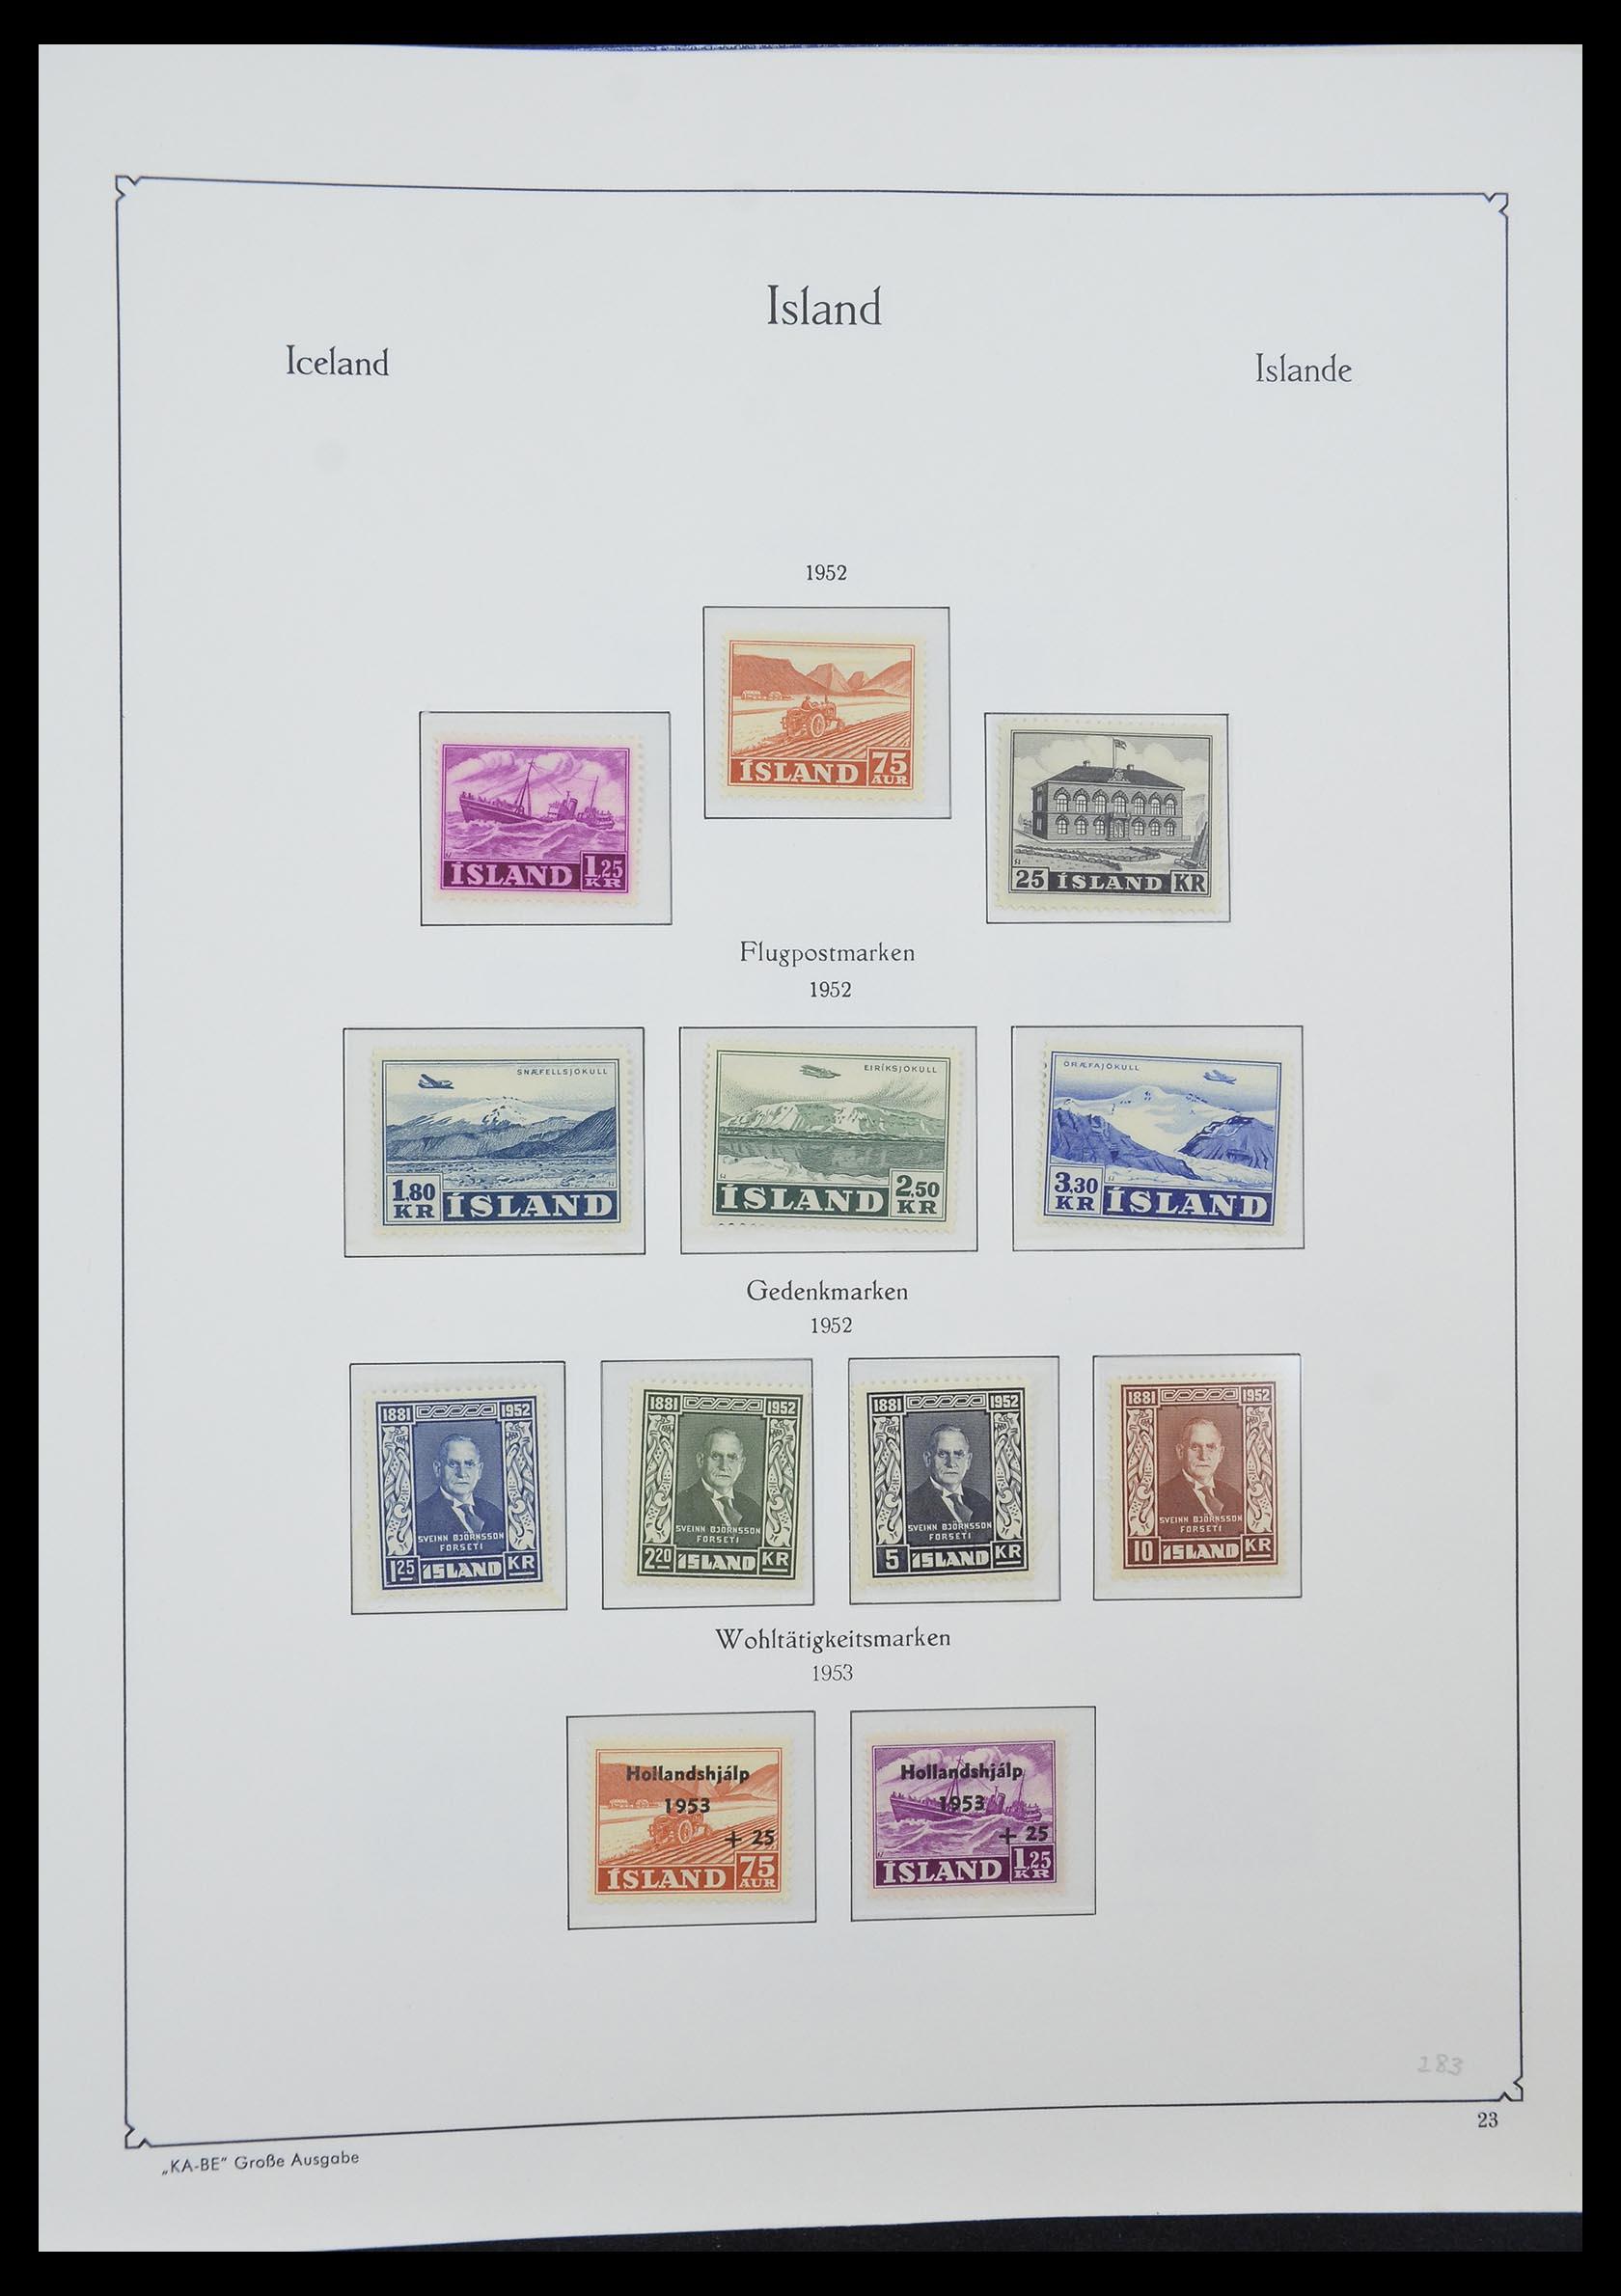 33185 006 - Postzegelverzameling 33184 Finland 1856-1990.